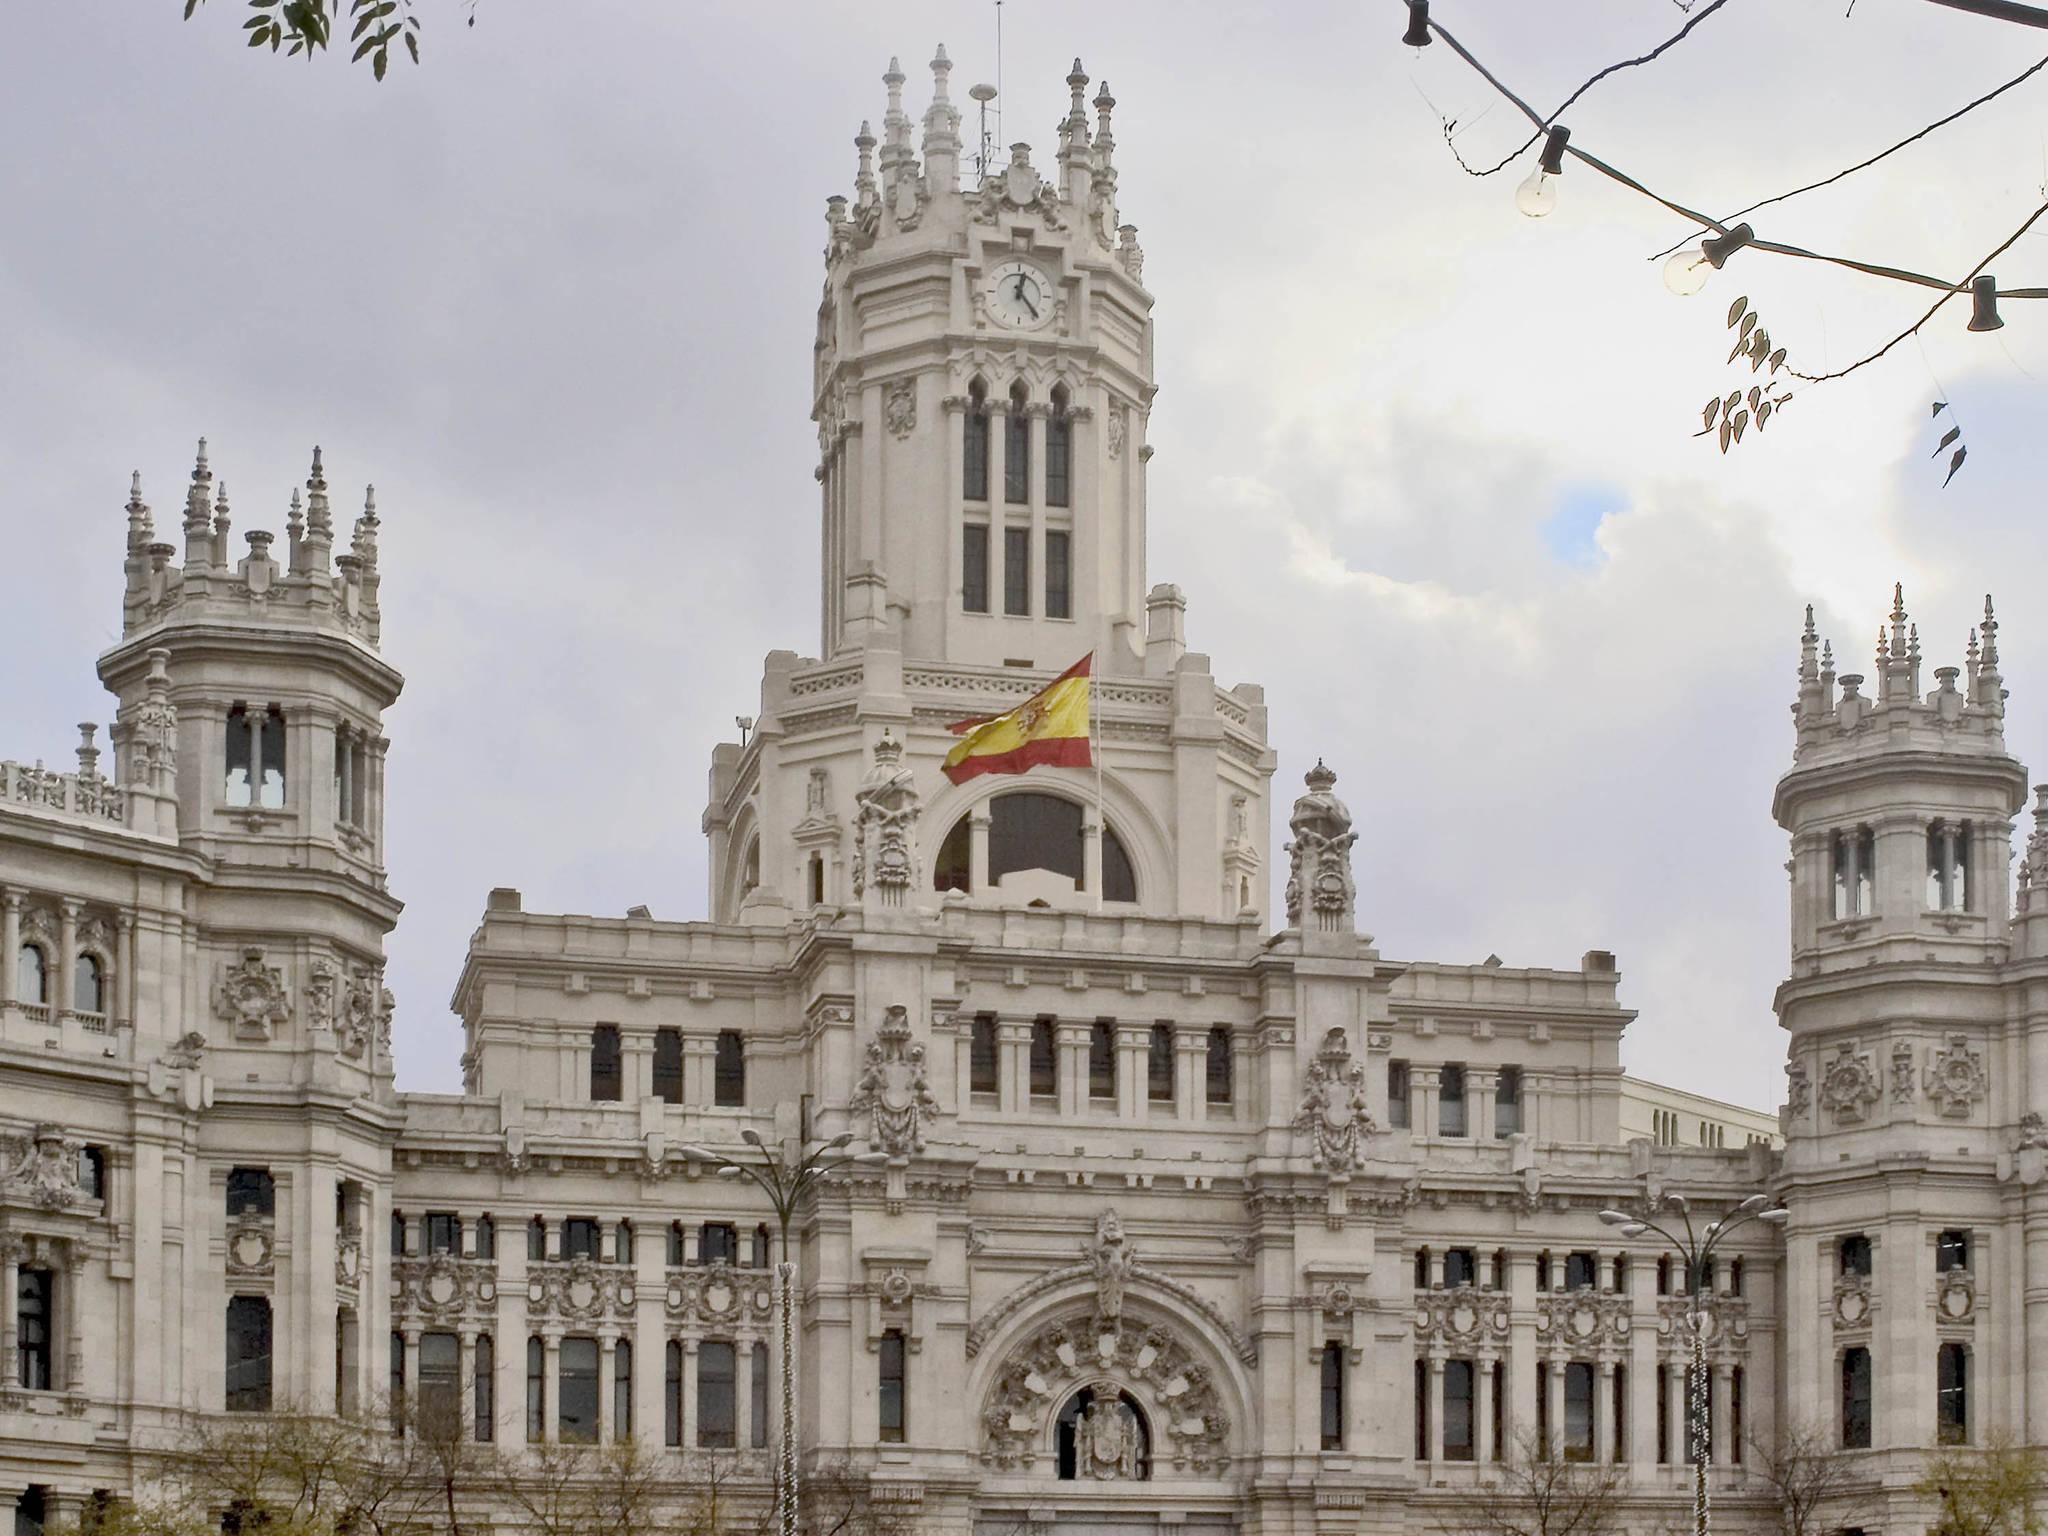 Ibis Budget Calle 30 Hotels In Madrid Accorhotelscom